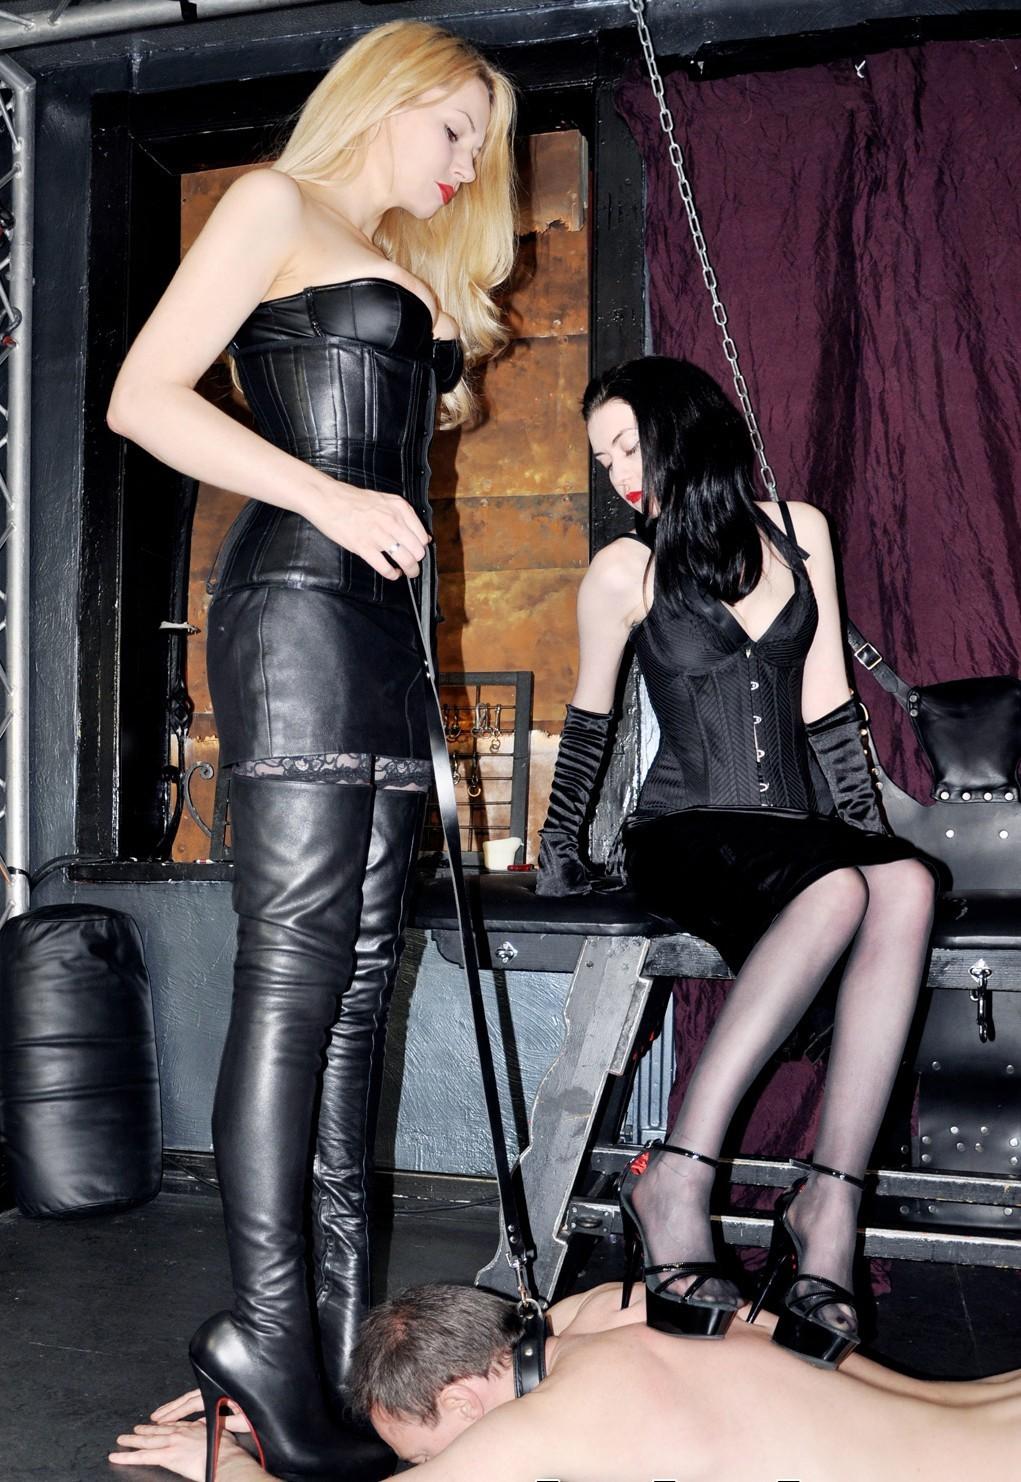 Black leather mask mistress of ceremonies - 3 4